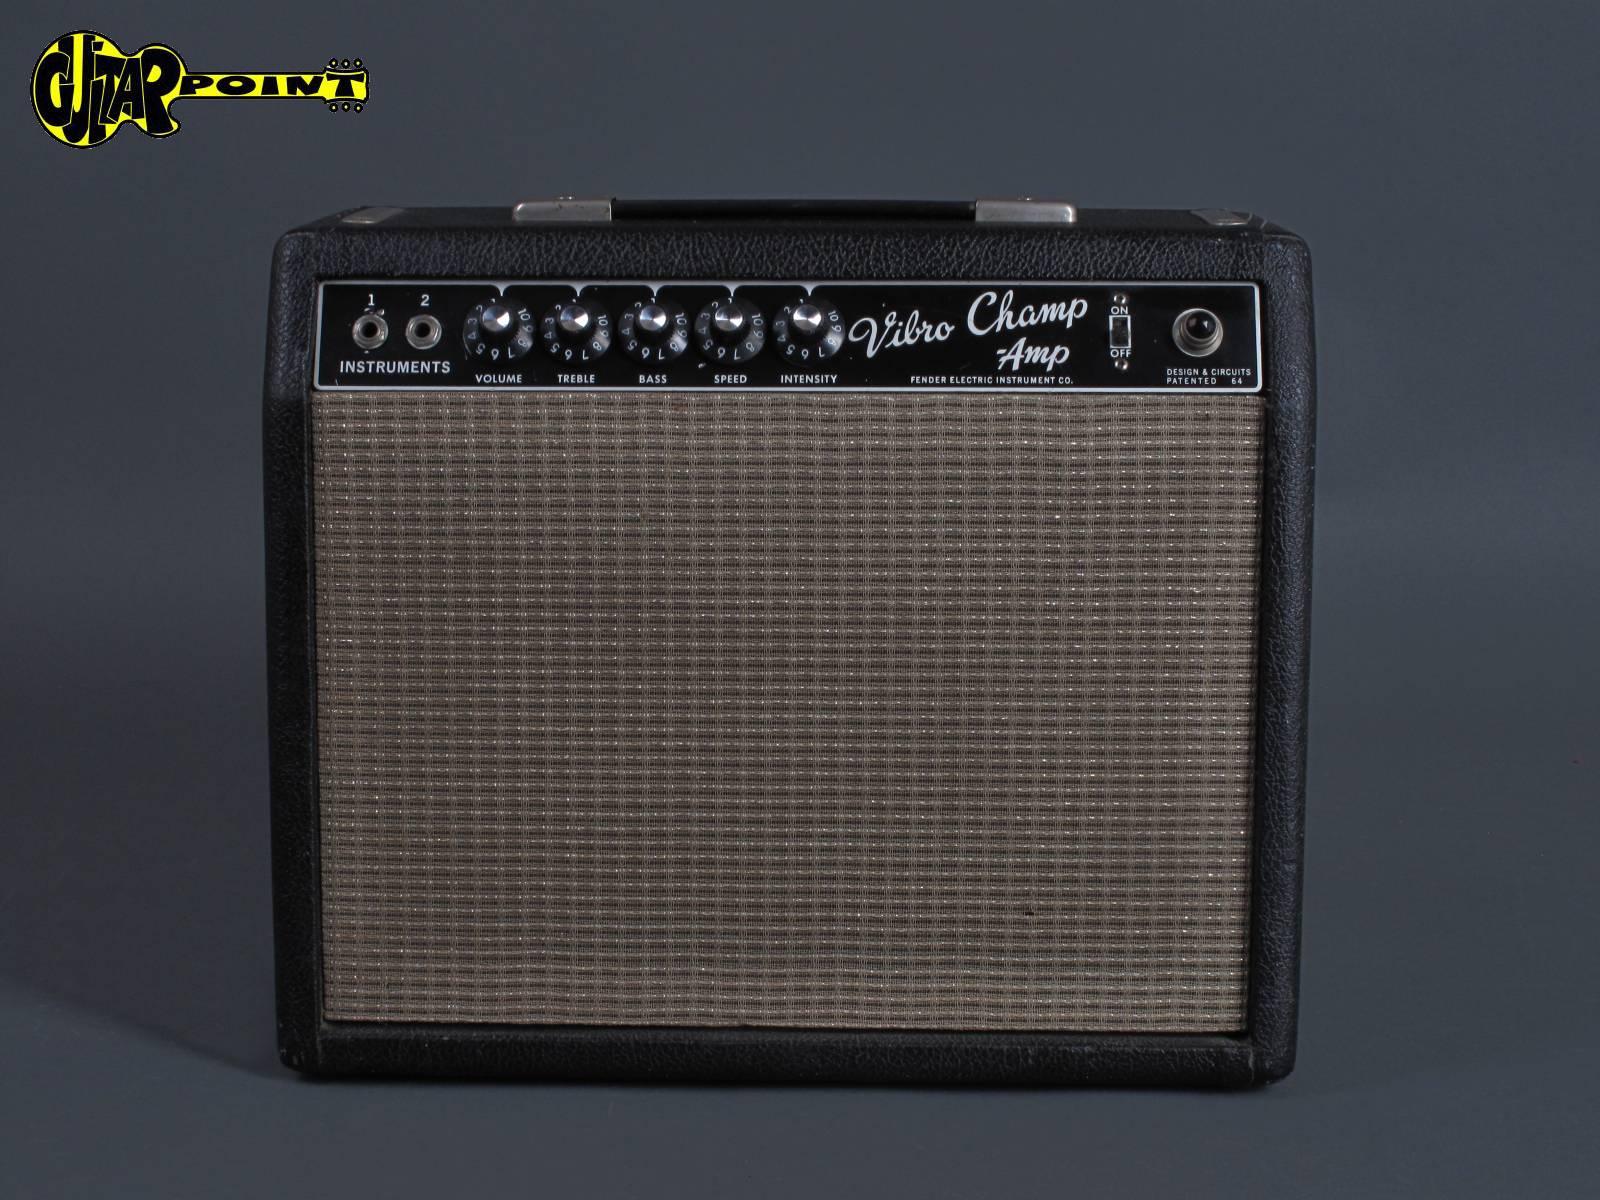 1965 Fender Vibro Champ Amp - Blackface